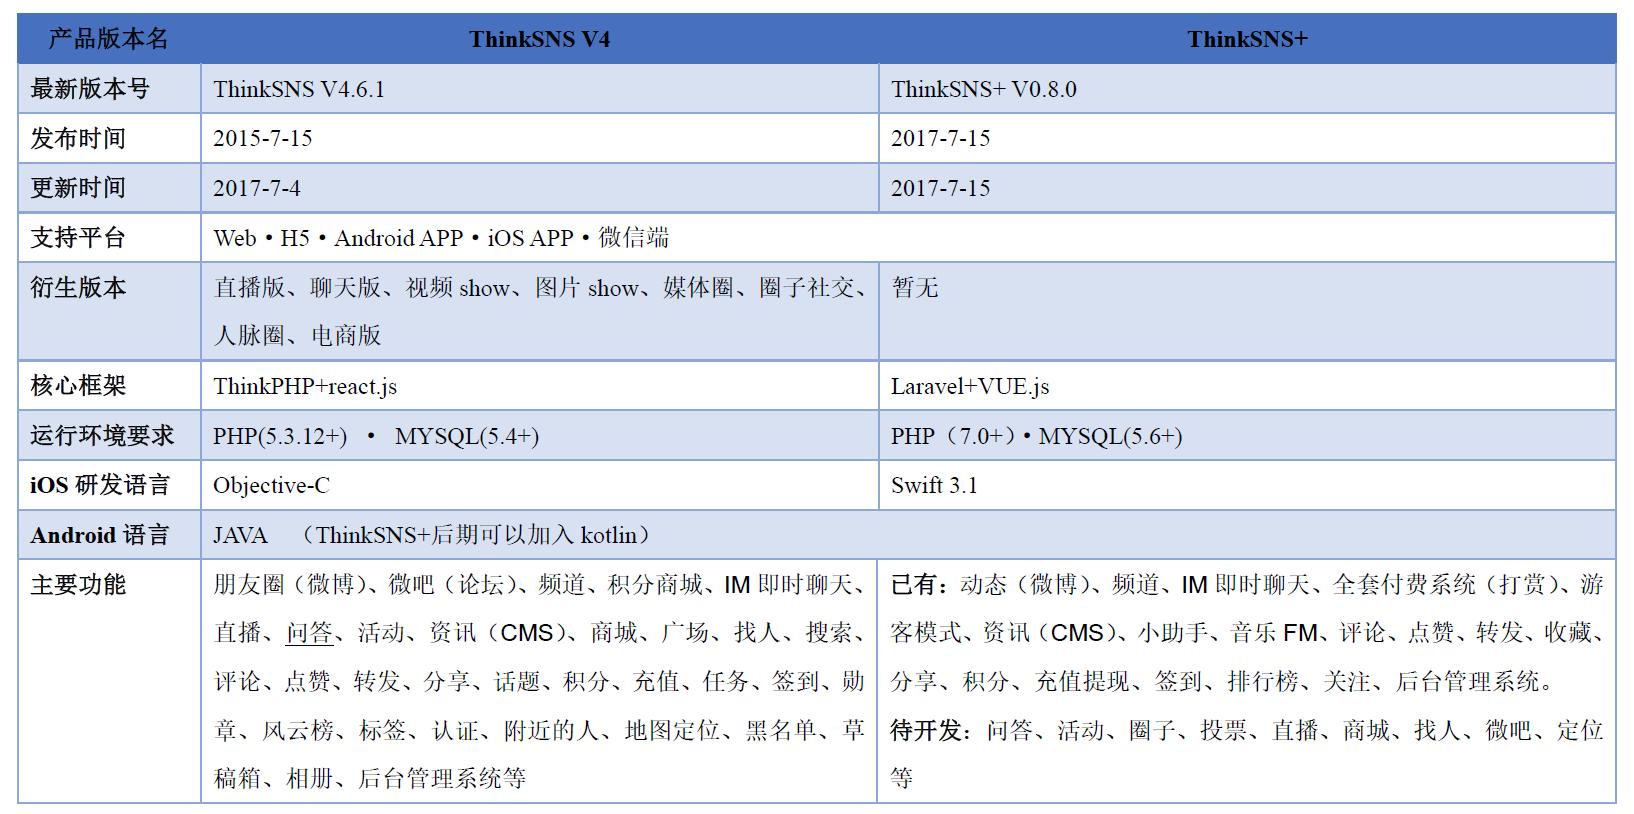 ThinkSNS V4与ThinkSNS+对比区别.png